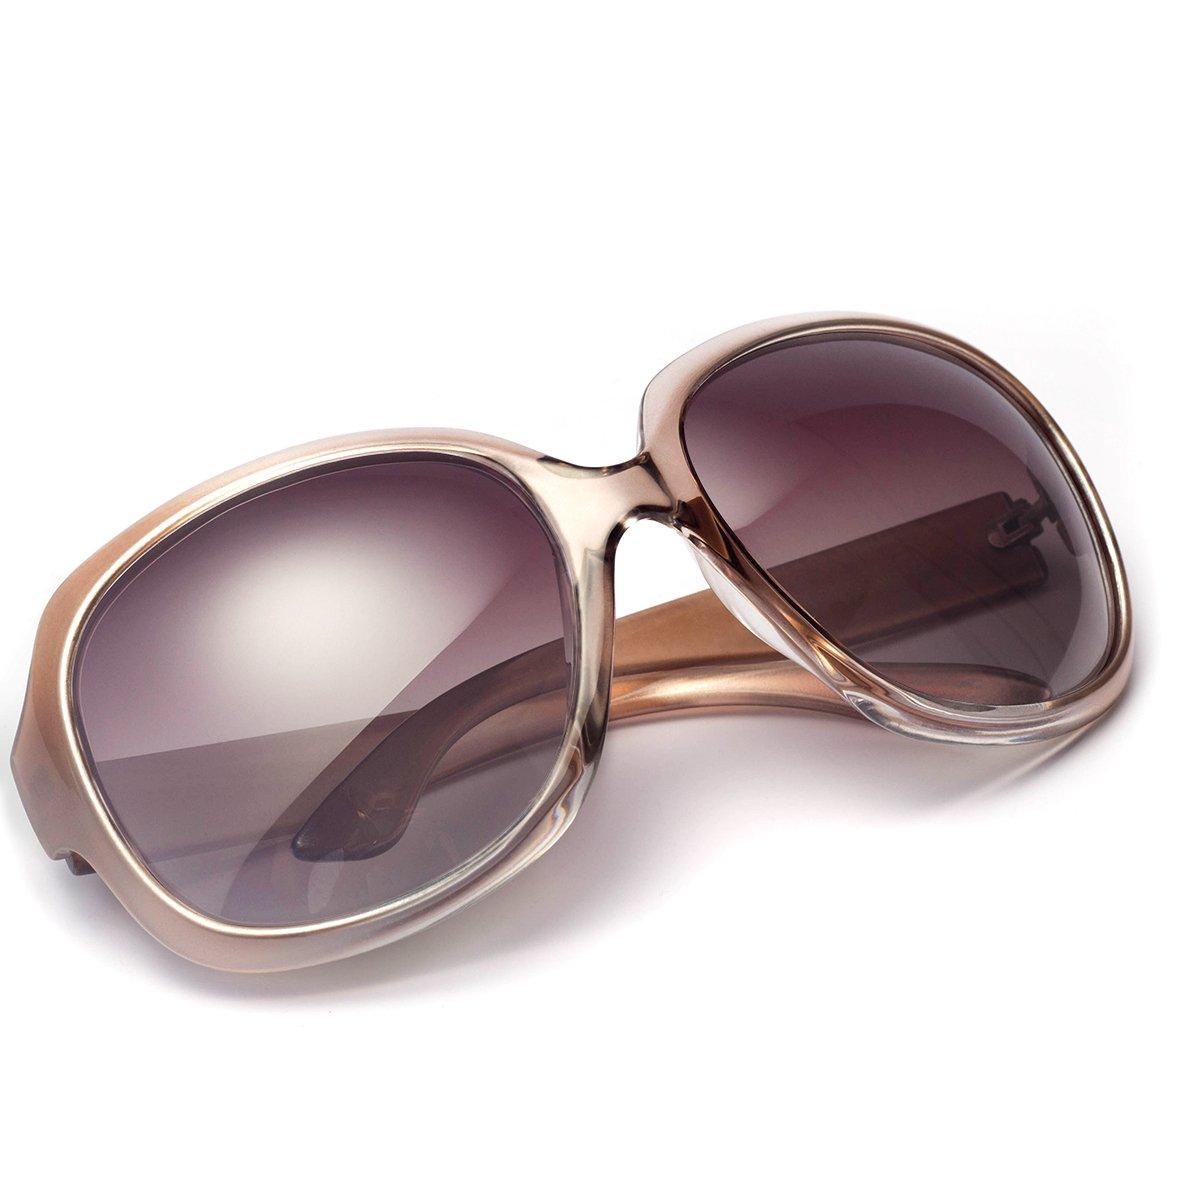 Polarized Sunglasses for Women, AkoaDa UV400 Lens Sunglasses for Female Fashionwear Pop Polarized Sun Eye Glass(Champagne) by AkoaDa